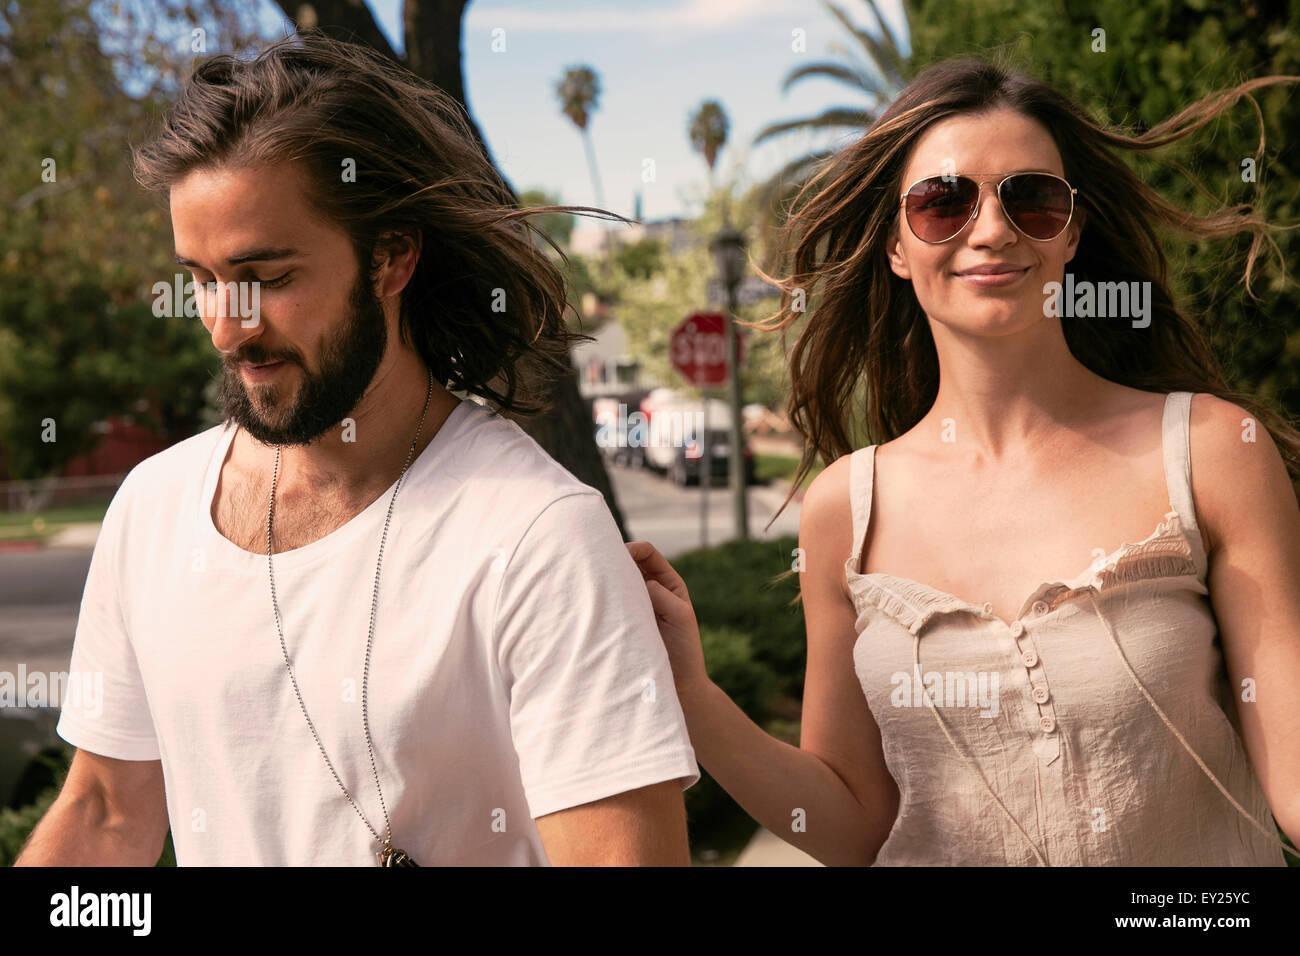 Young couple walking along street - Stock Image